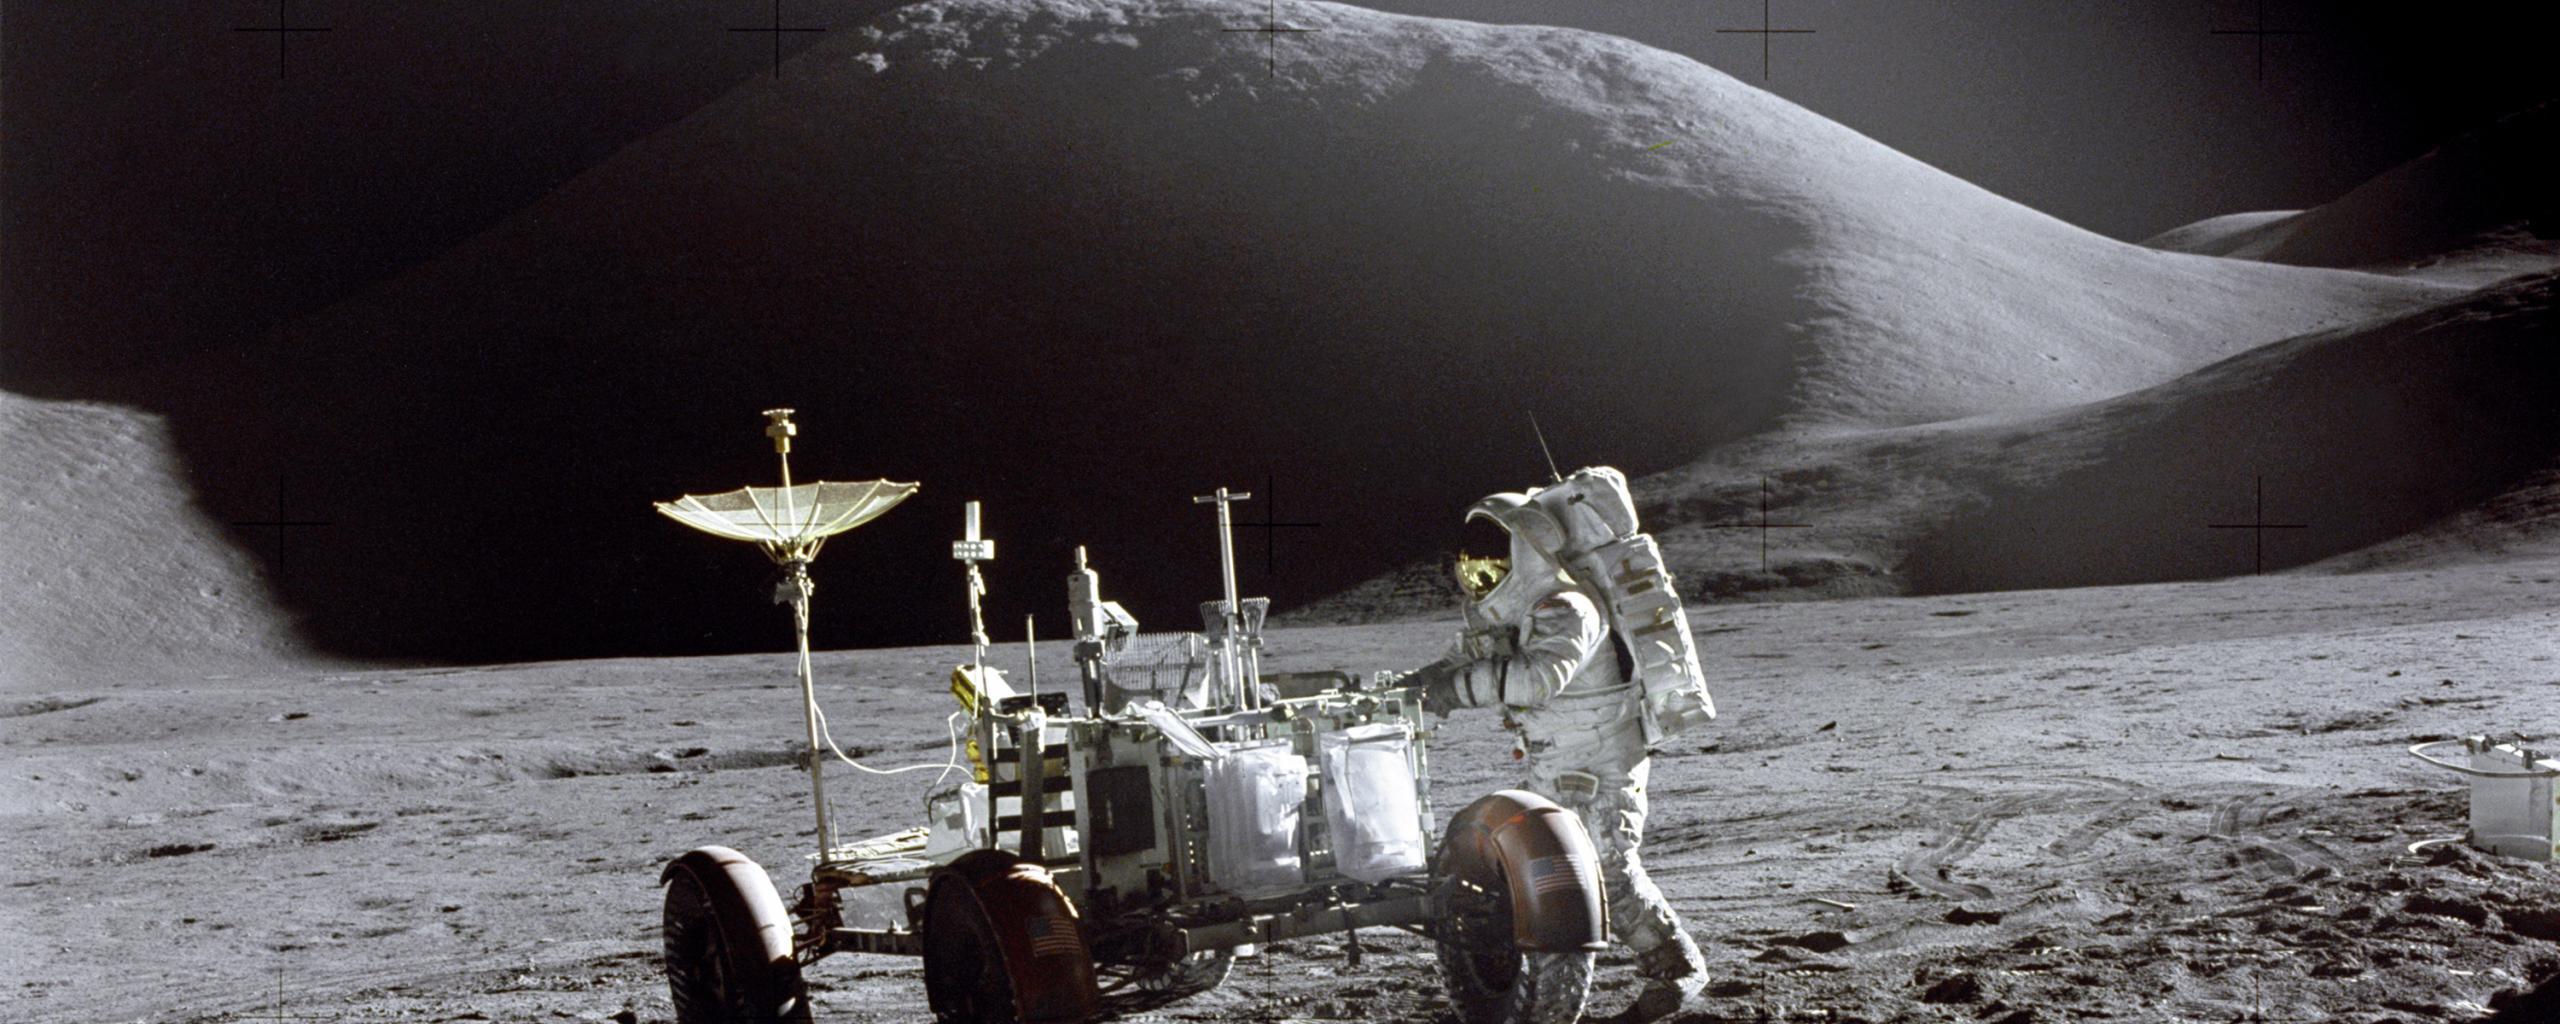 James B. Irwin next to lunar rover, Apollo 15